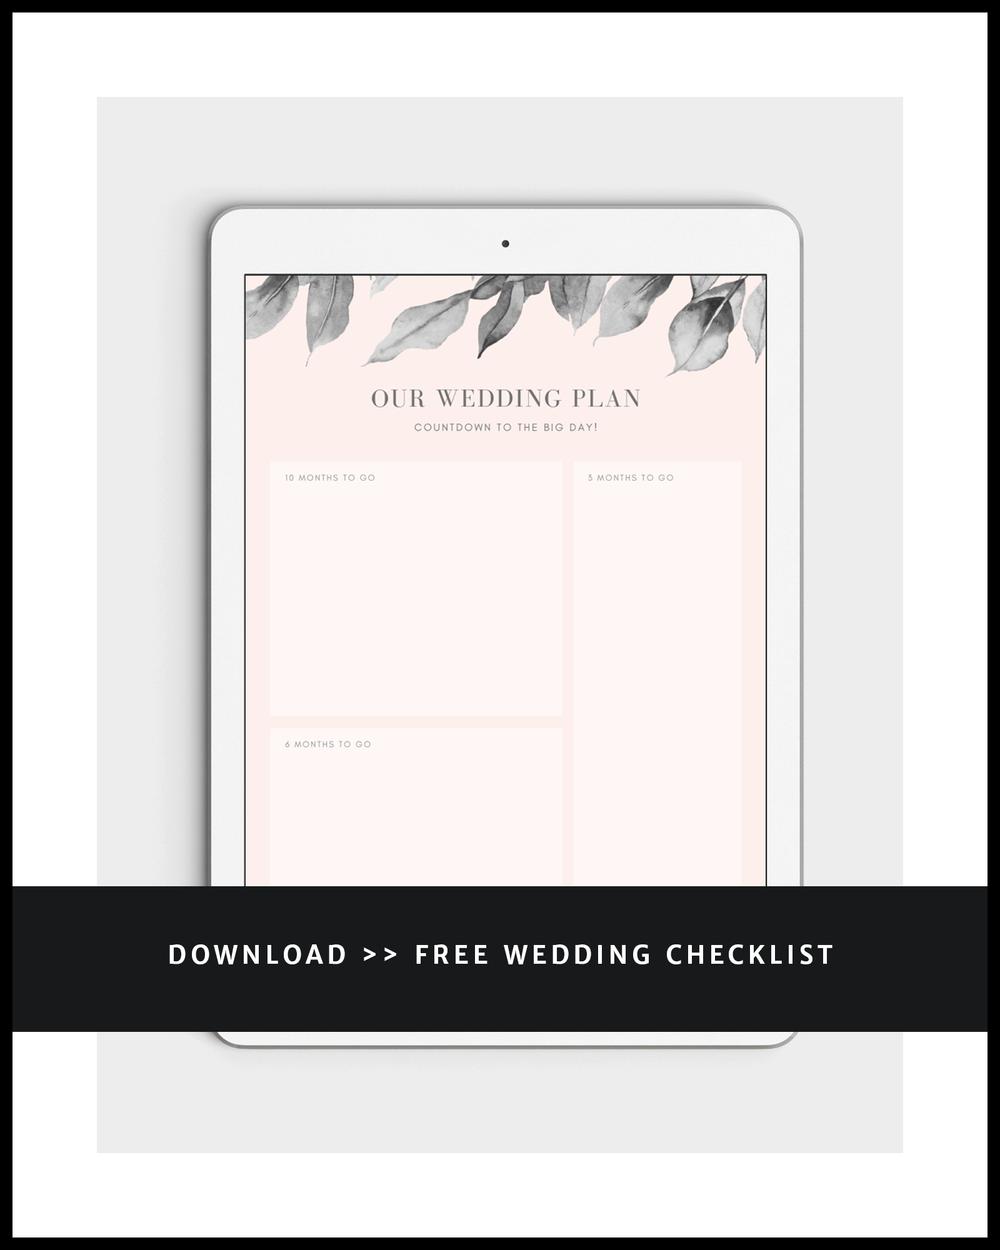 iPad mockup with elegant minimalist pink grey leaves wedding checklist - our wedding plan, countdown to the big day - download the free wedding checklist